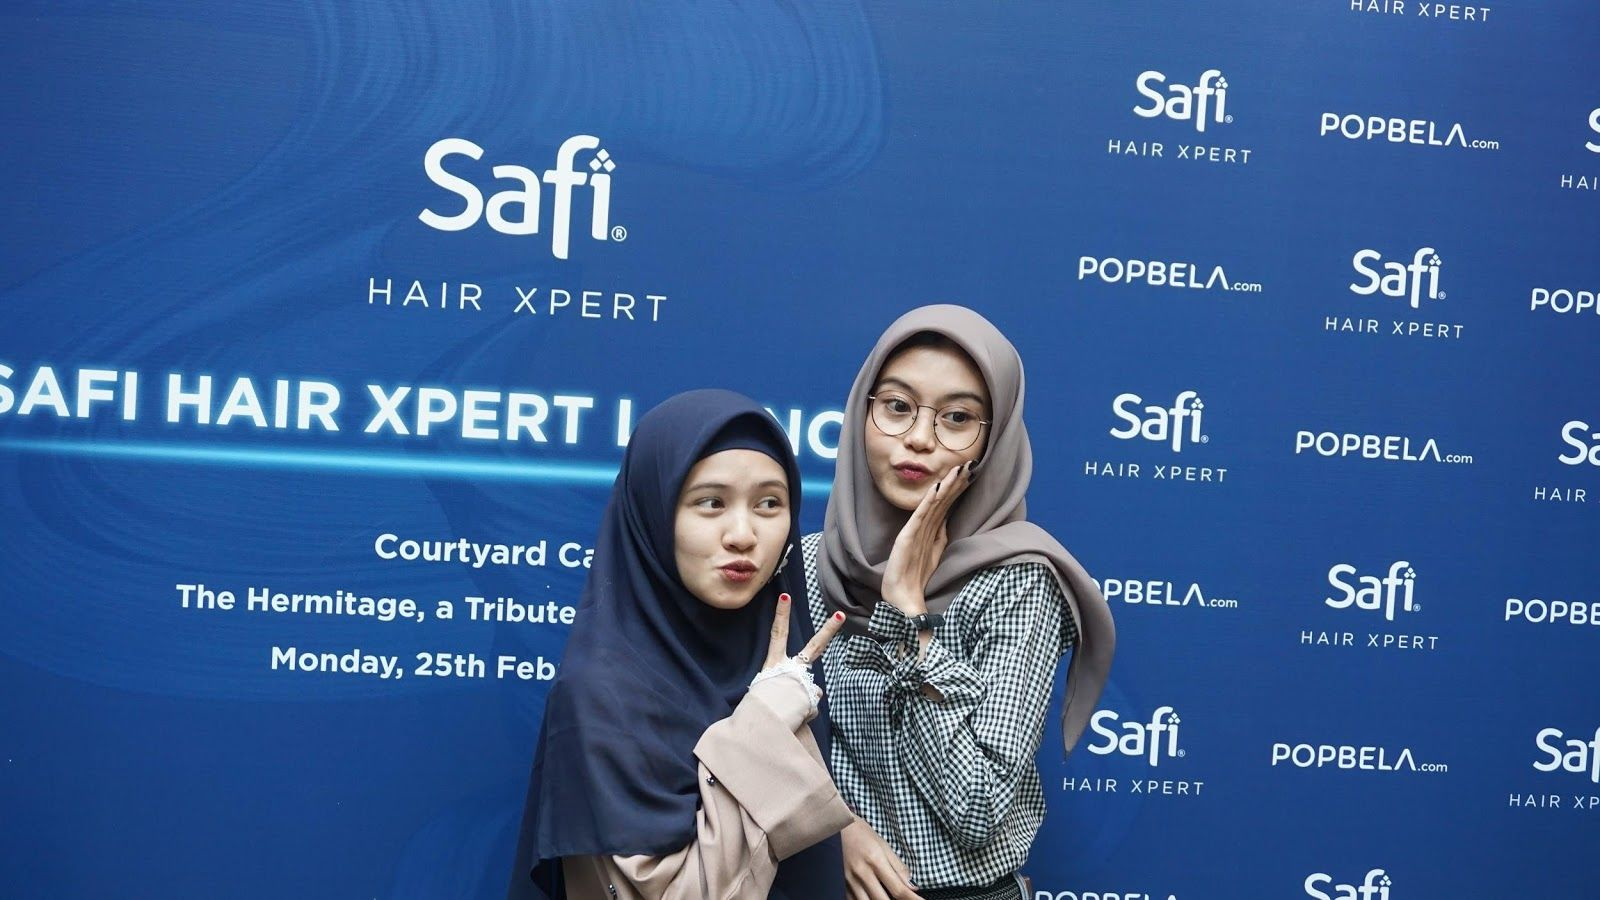 Cewek Hijab Suka Bingung Pilih Shampoo? Safi Launching Inovasi Terbaru